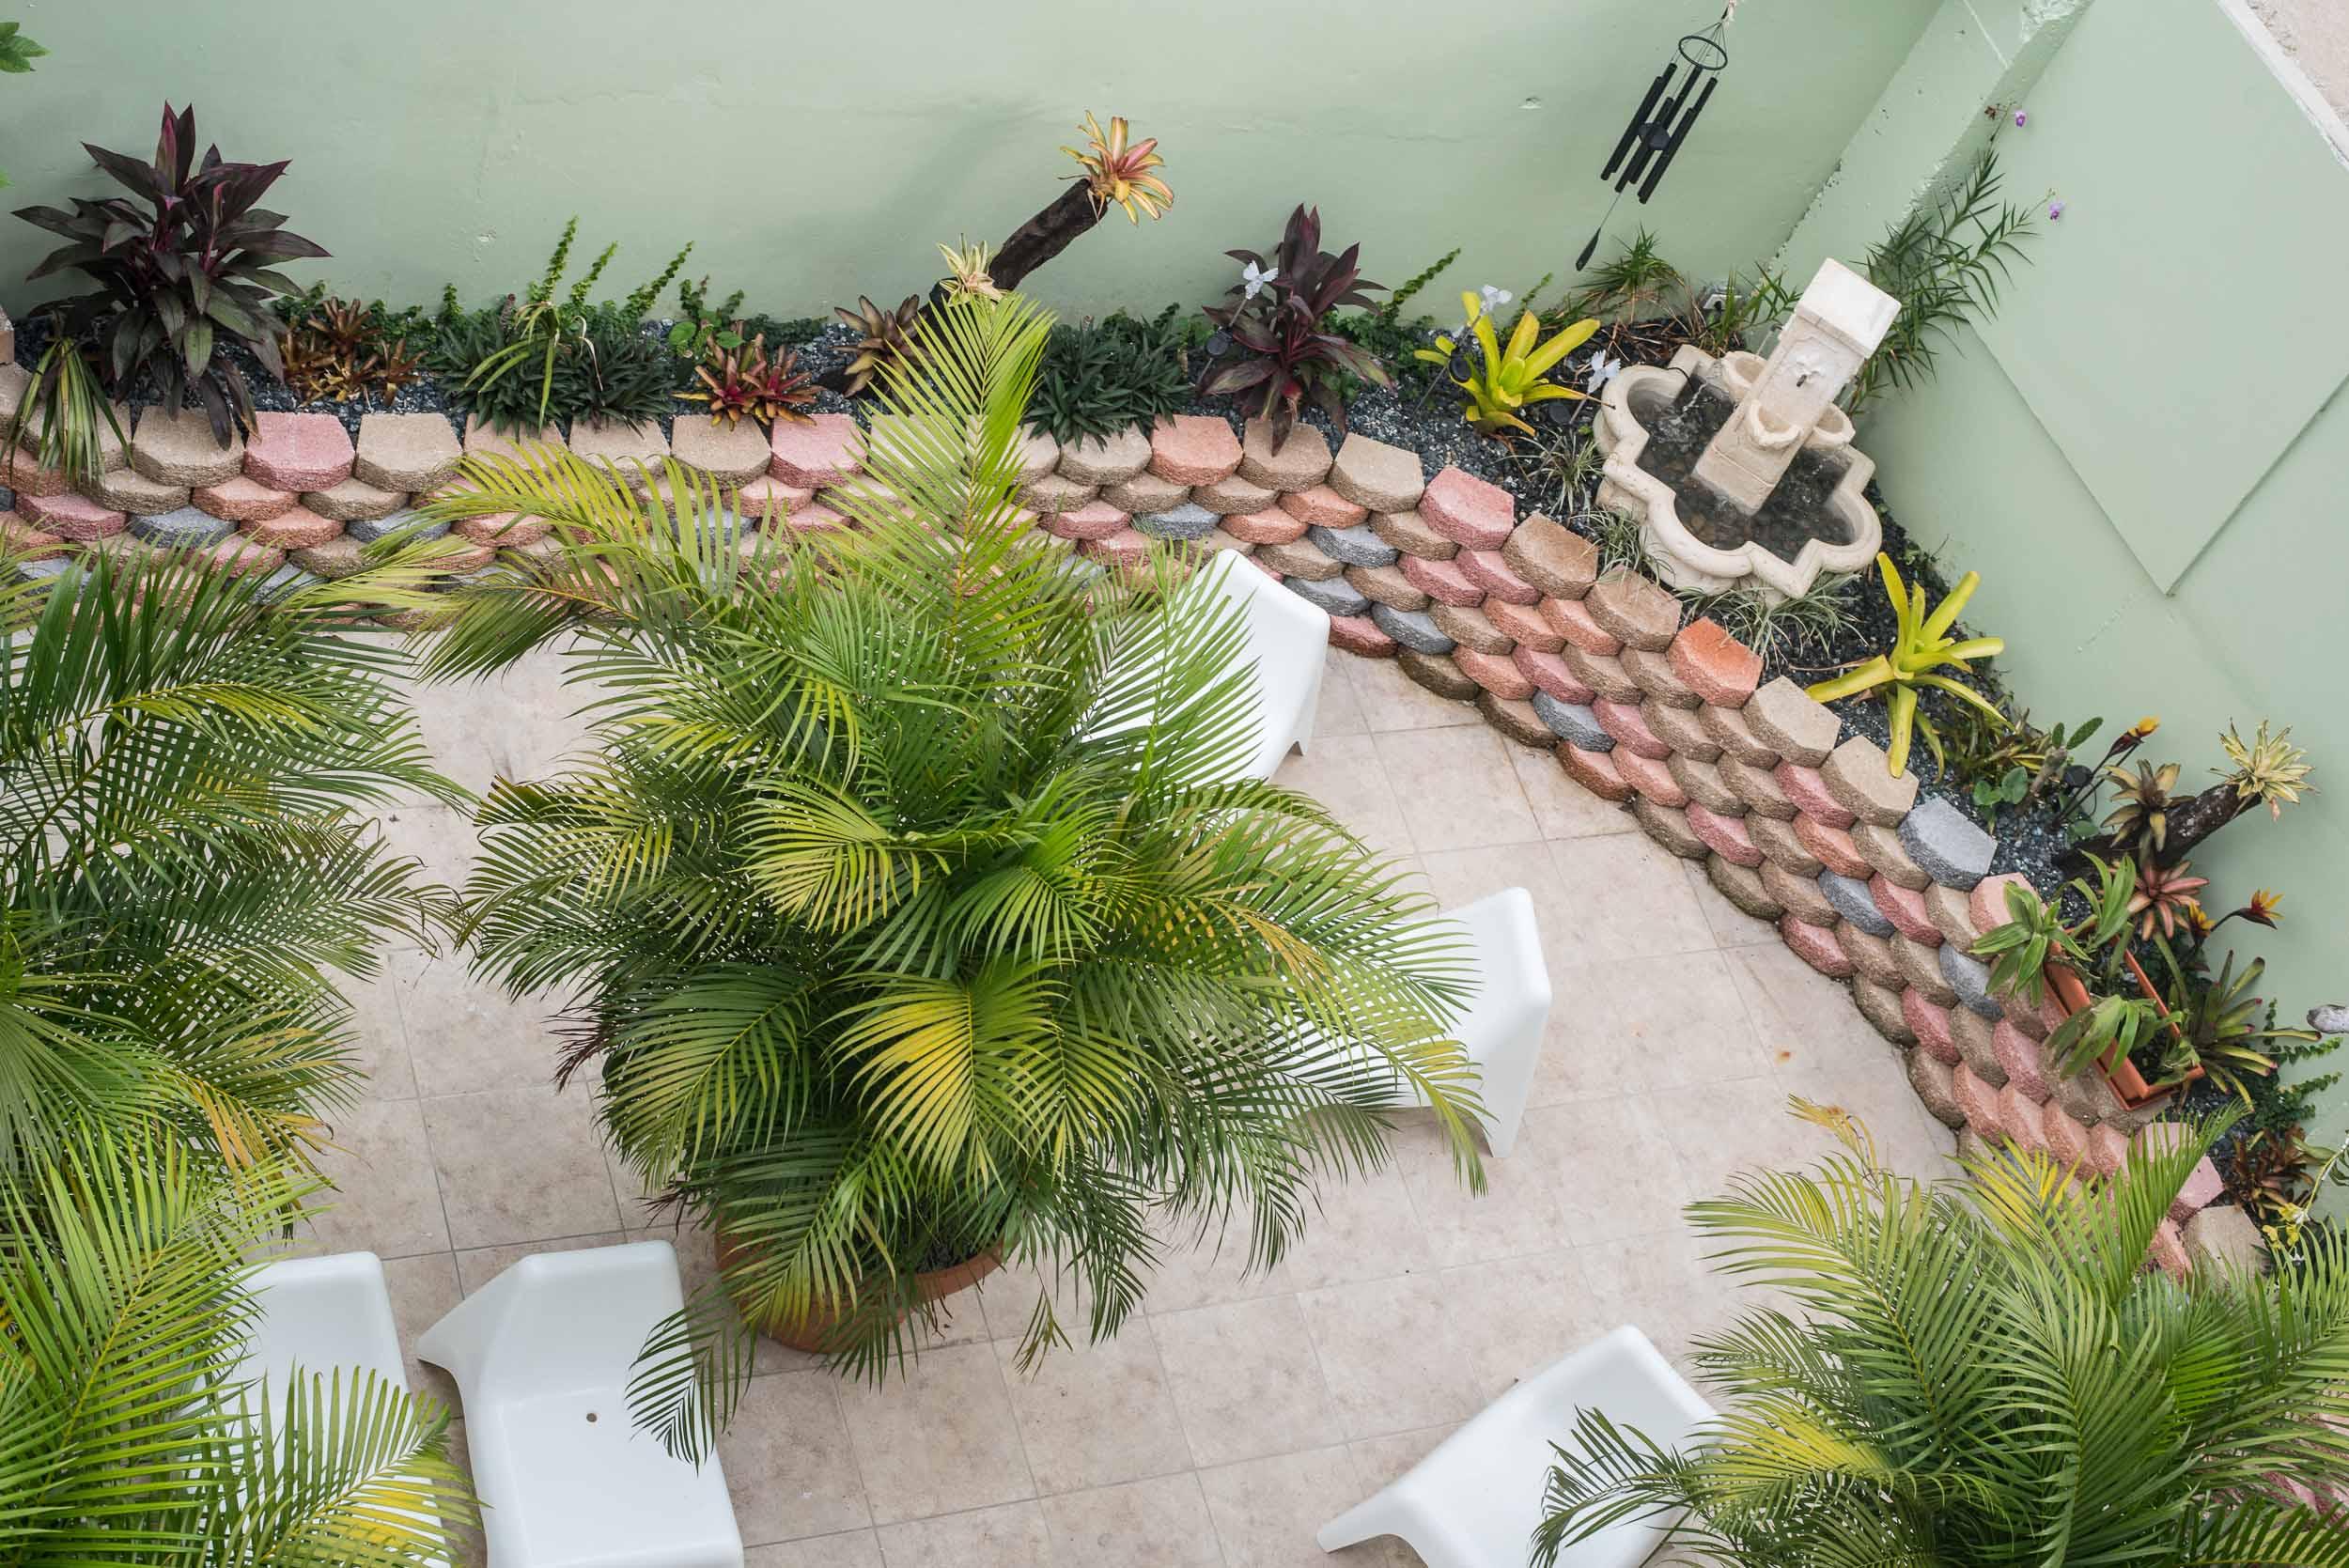 First level restorative garden and grove